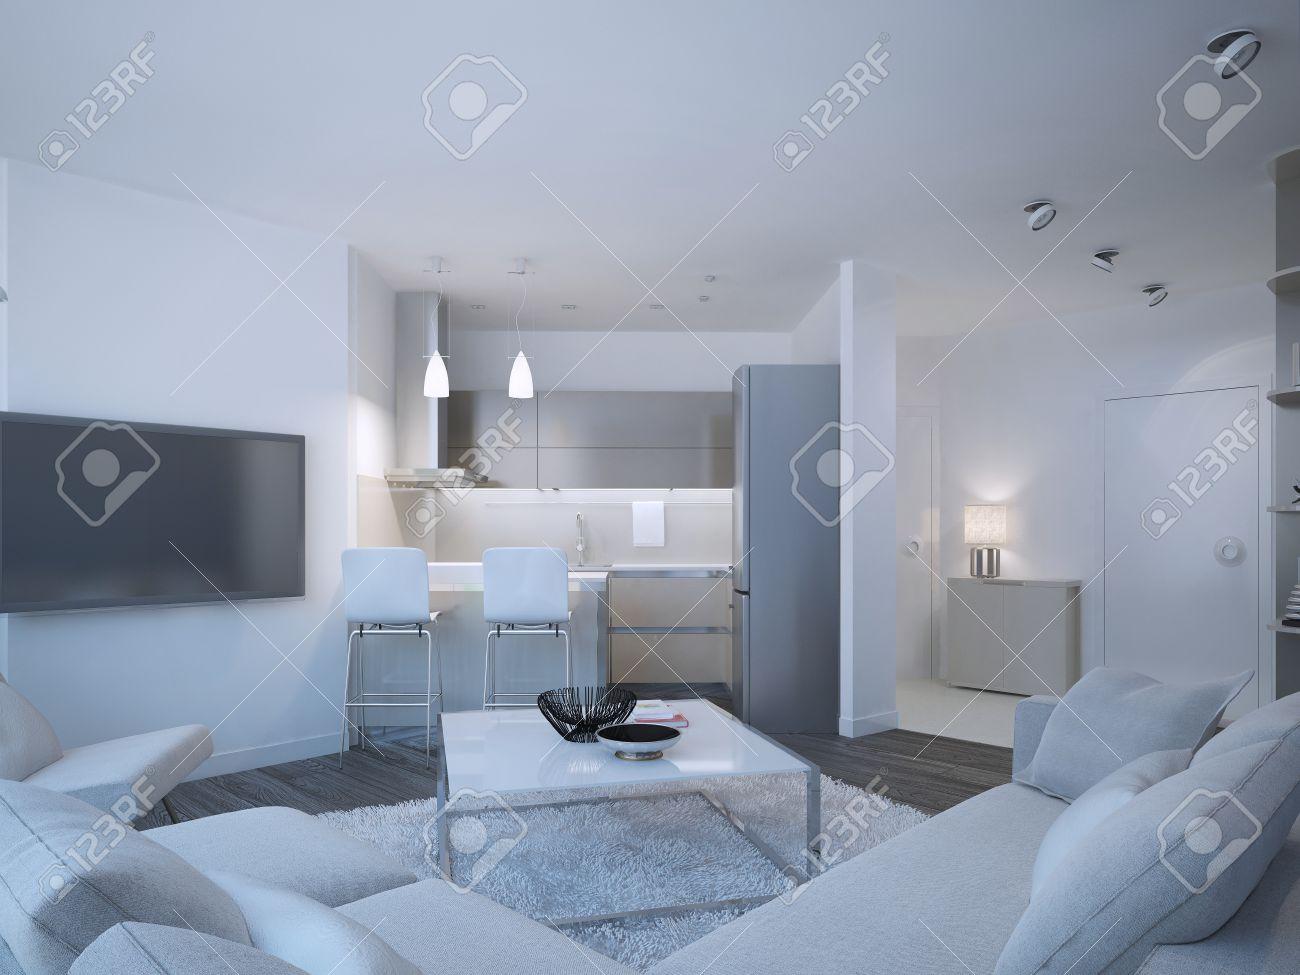 Apartamento Estudio Escandinavo, Con Pequeña Cocina Contemporánea ...